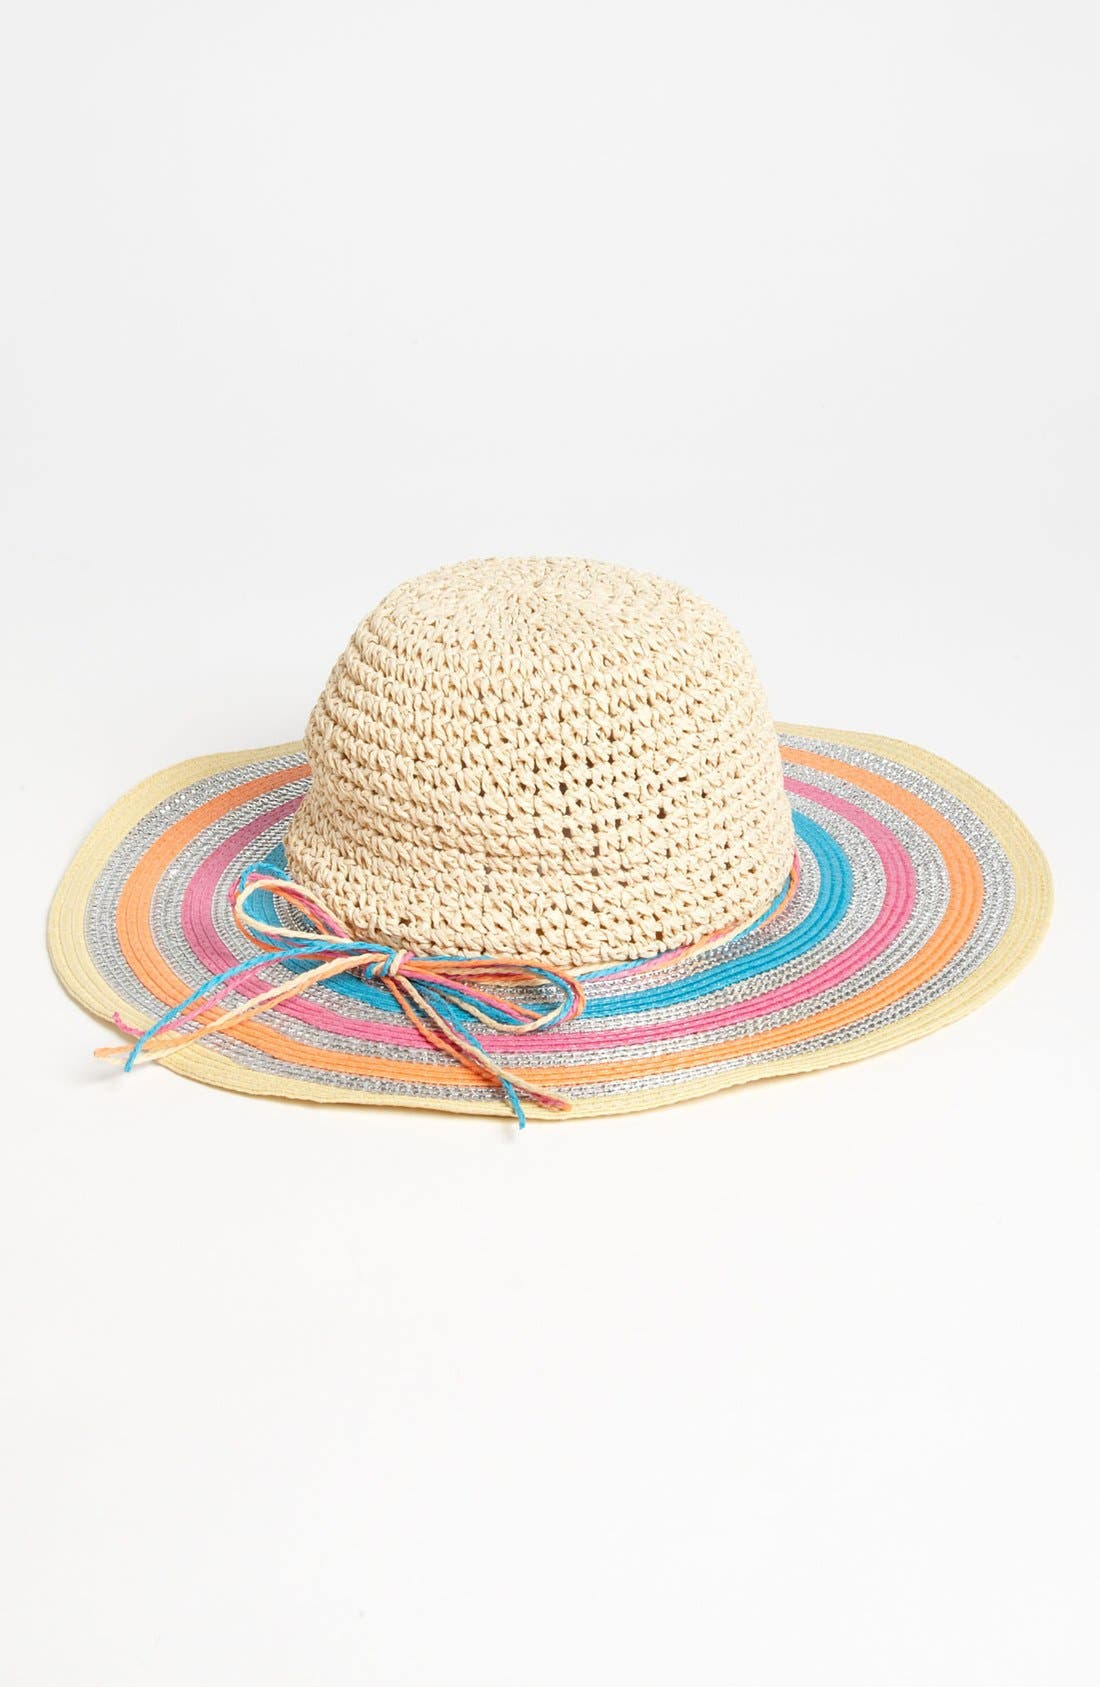 Alternate Image 1 Selected - Capelli of New York Floppy Hat (Girls)